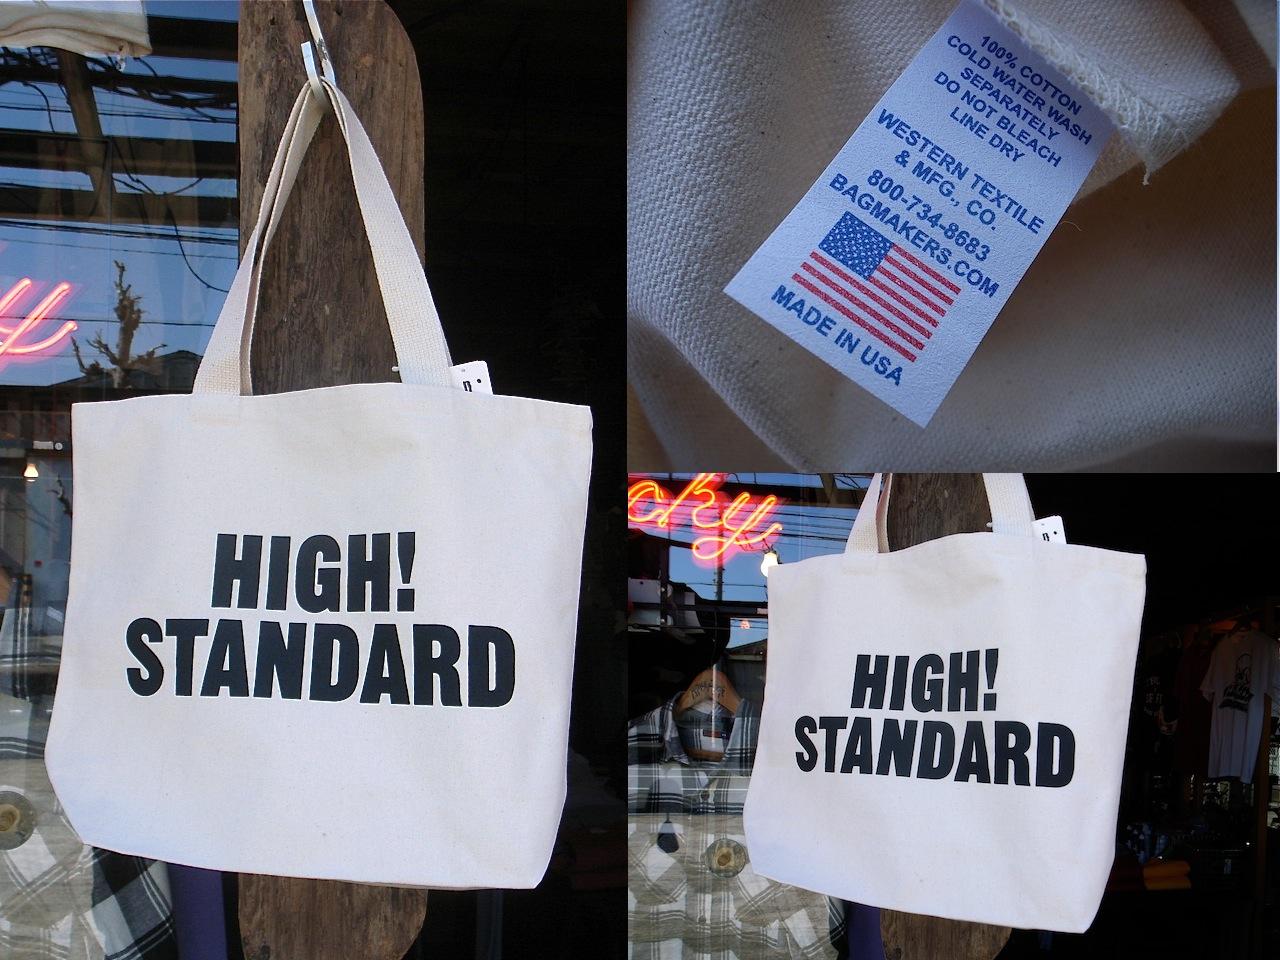 9a19874a6b7 HIGH! STANDARD (CANVAS TOTE BAG) | welcoblog